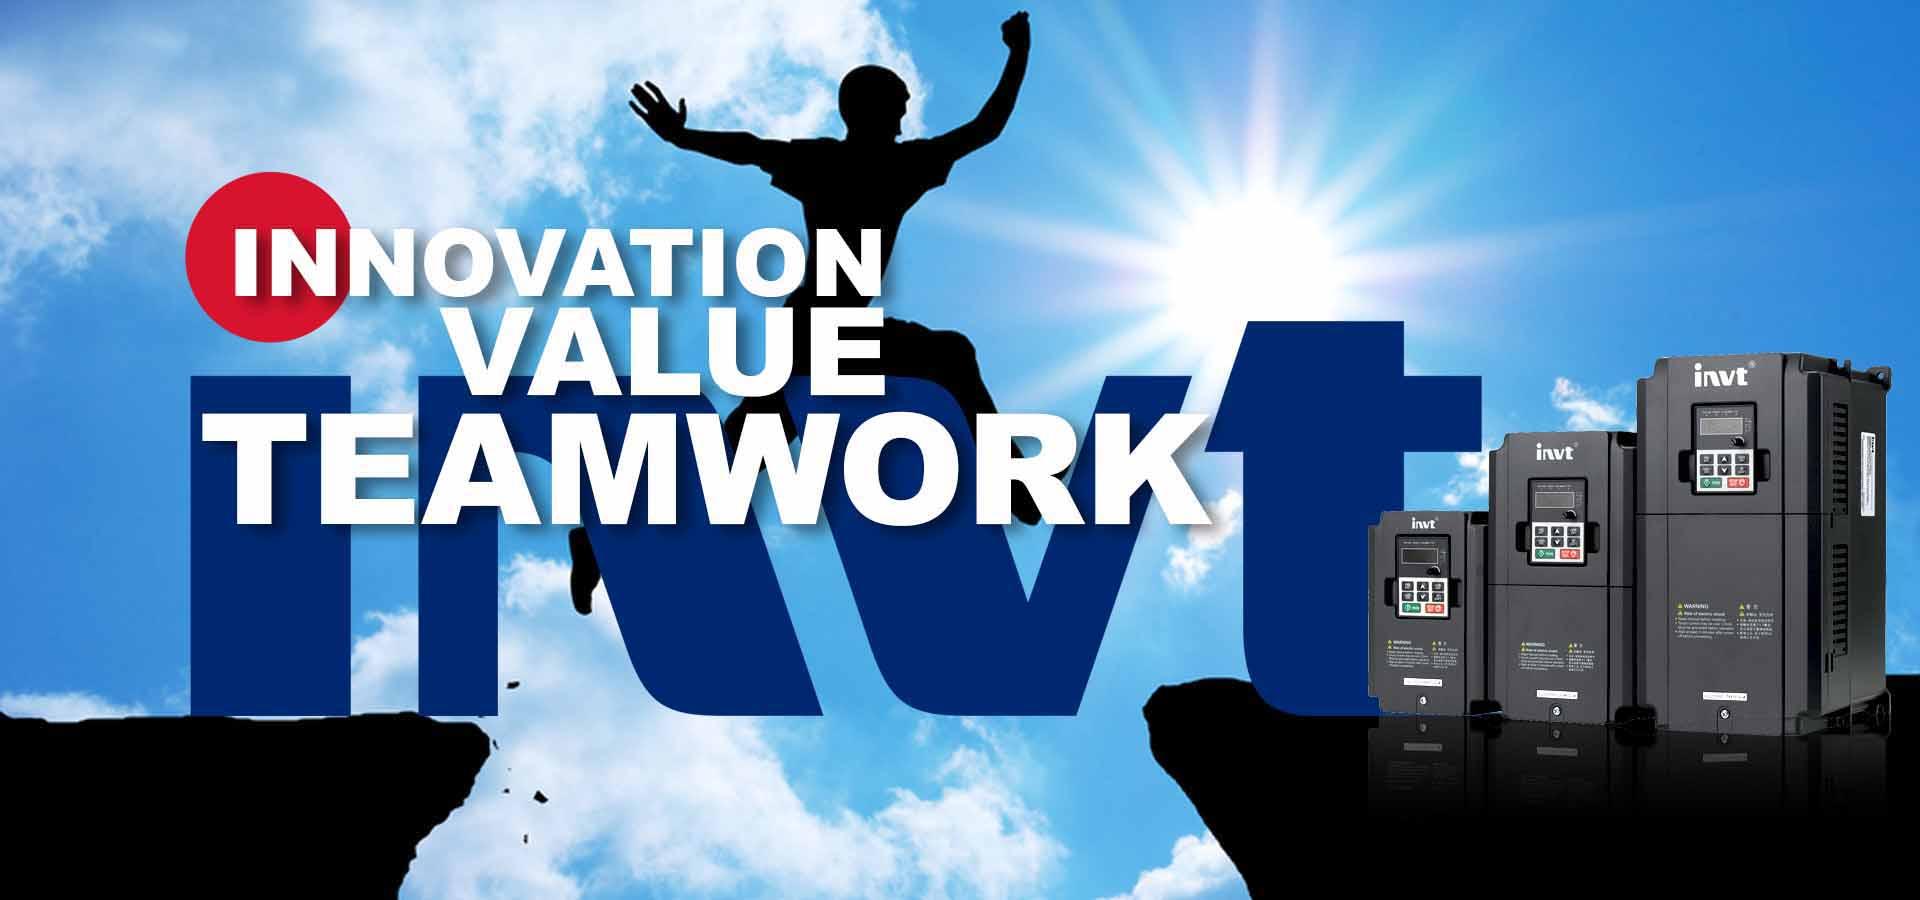 Solar Inverters Off Grid Hybrid Tied Inverter In Pakistan Gridtie Metering Diagram Invt Innovation Value Teamwork Vfd Pump